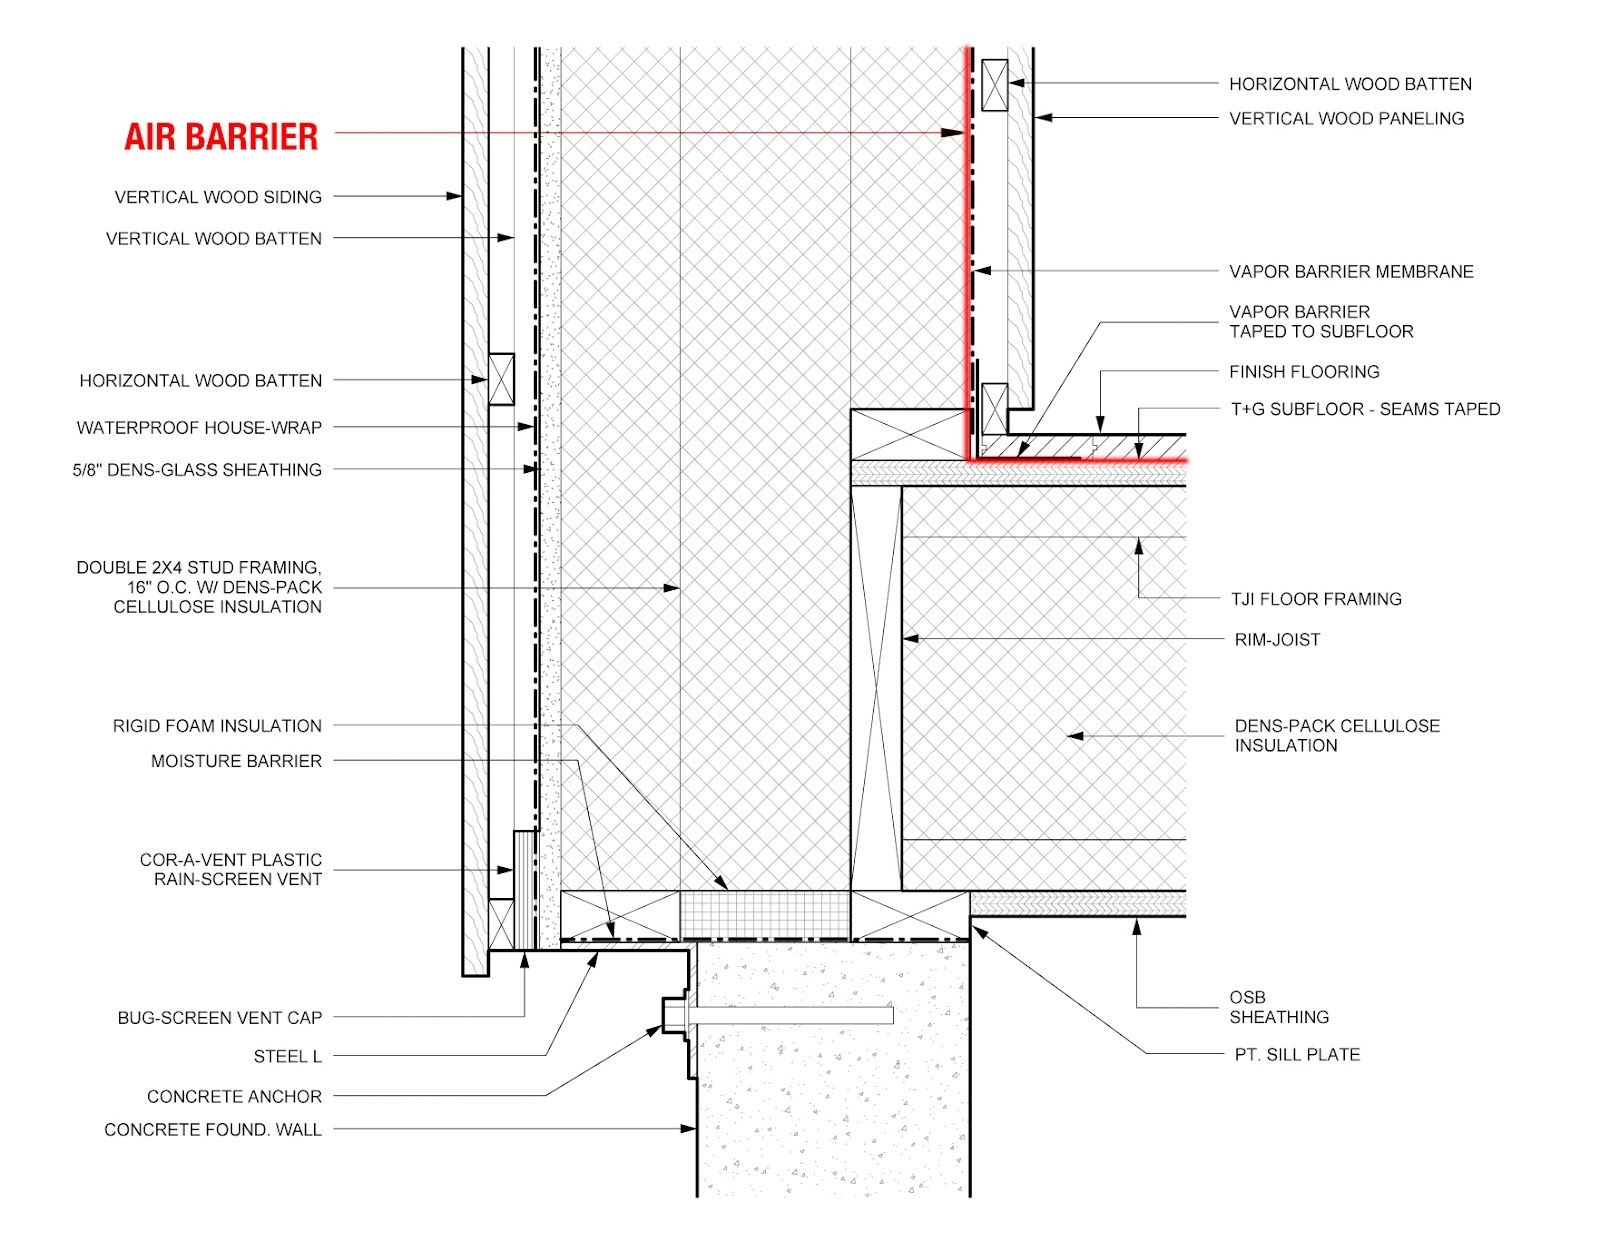 Bldgtyp Wis Air Seal Jpg 1600 1242 Floor Framing Vertical Wood Siding Flat Roof Construction